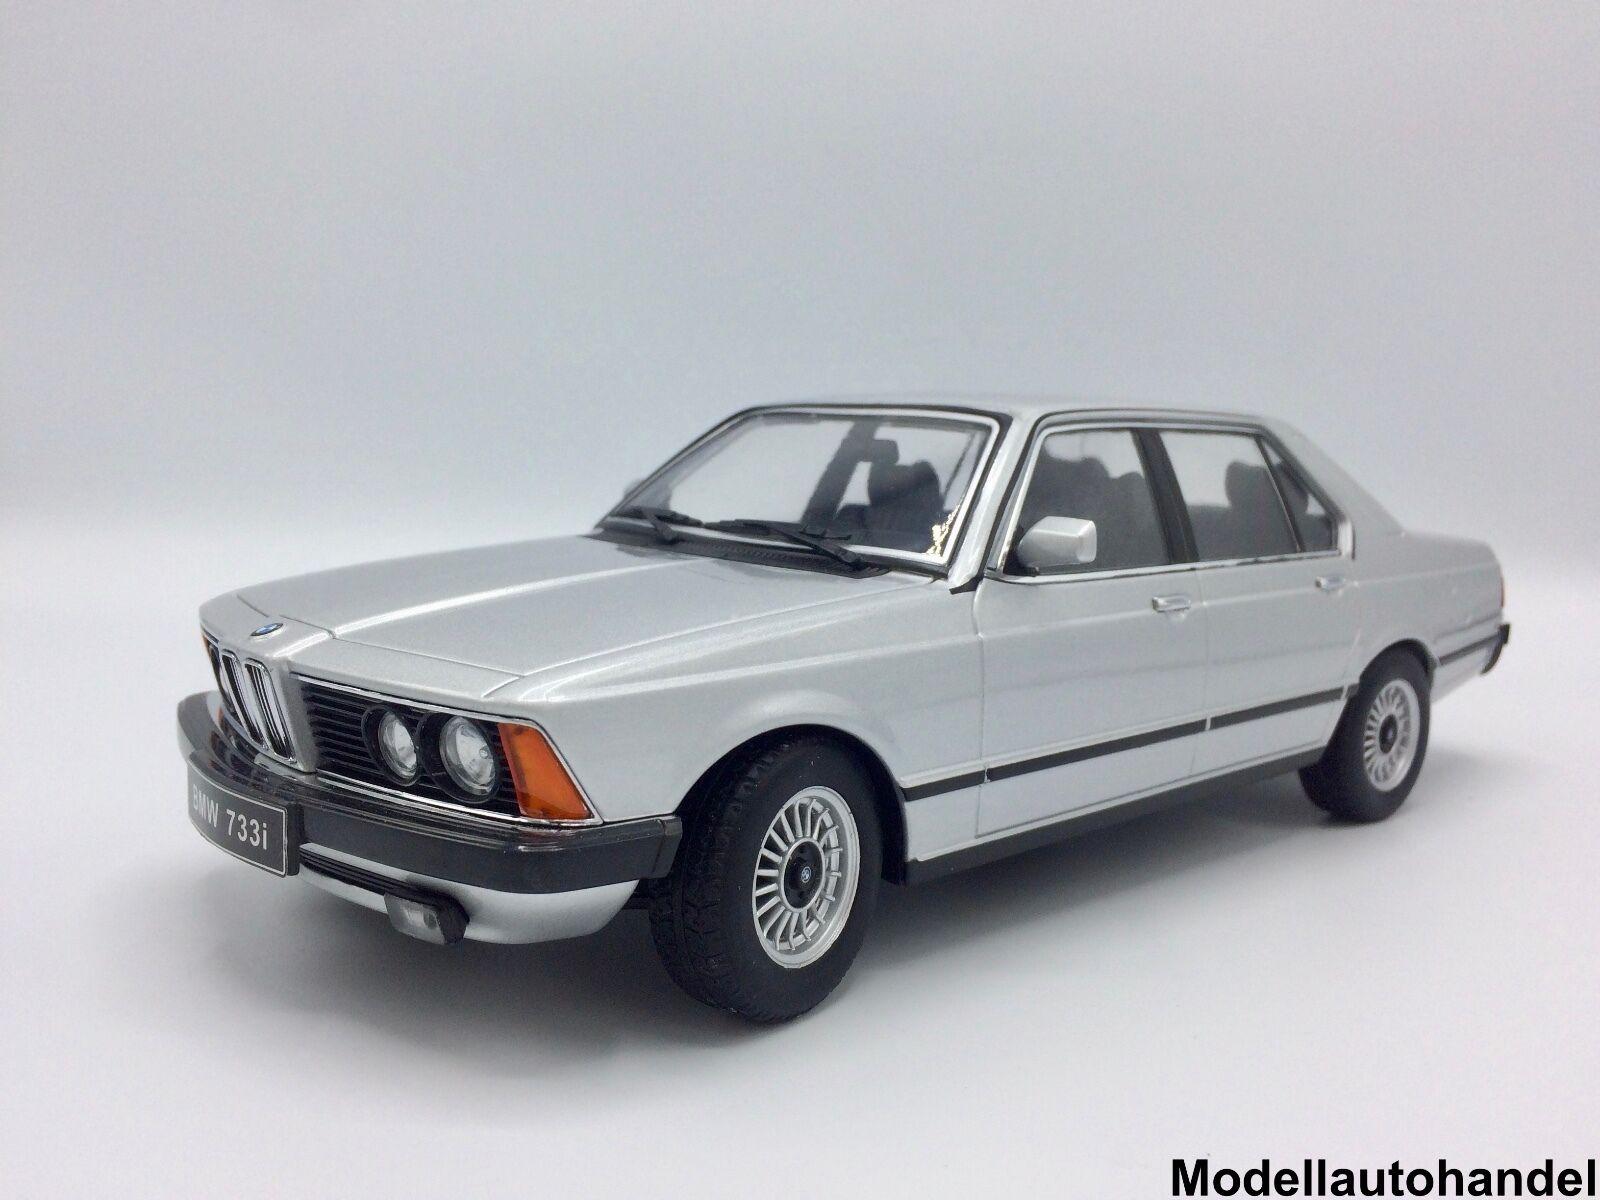 Bmw 733i (e23) de plata 1977 - 1 18 KK-Scale KK-Scale KK-Scale eb6a51